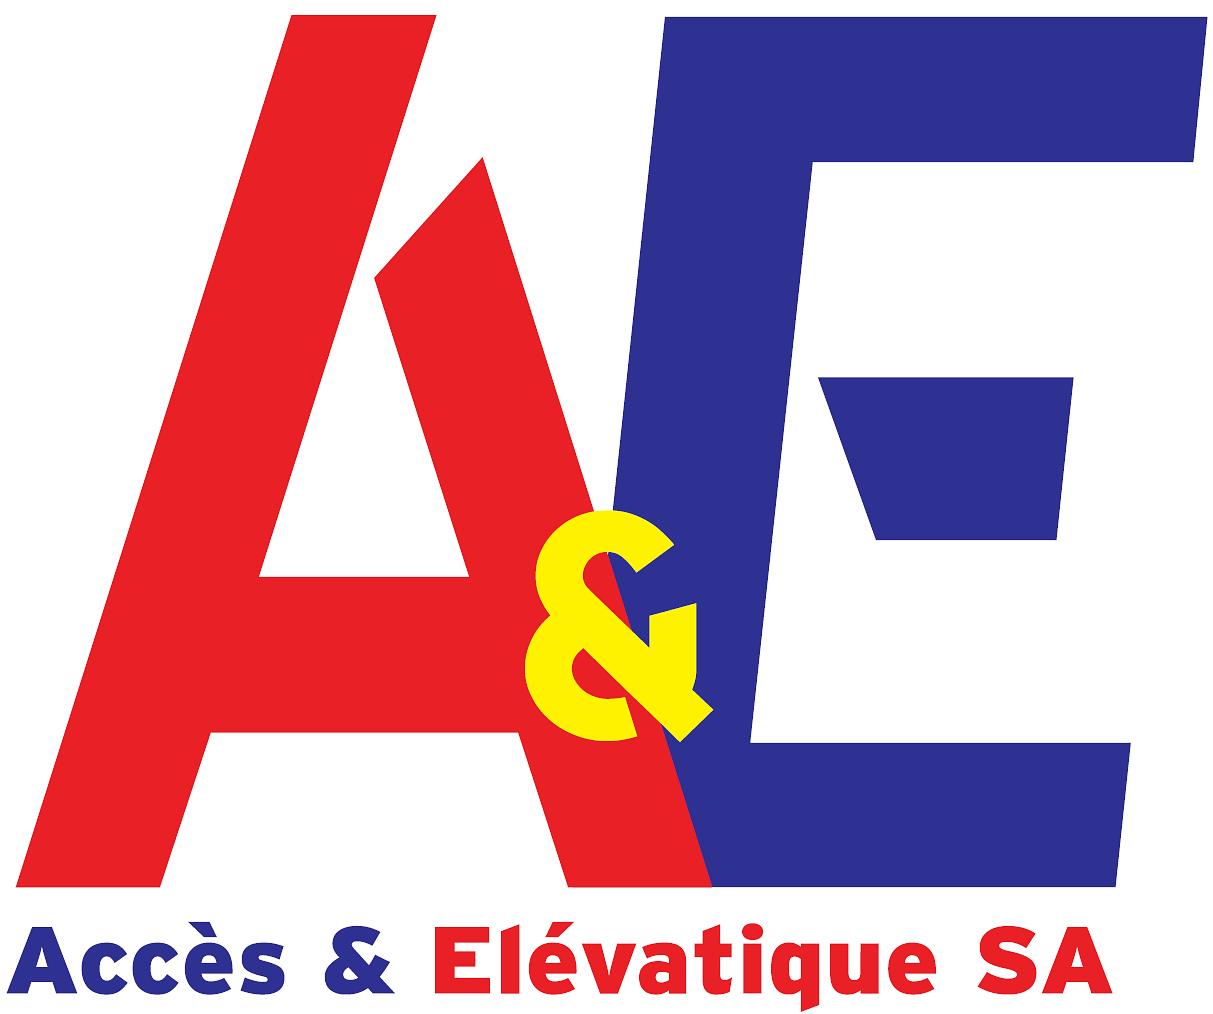 Accès & Elévatique SA